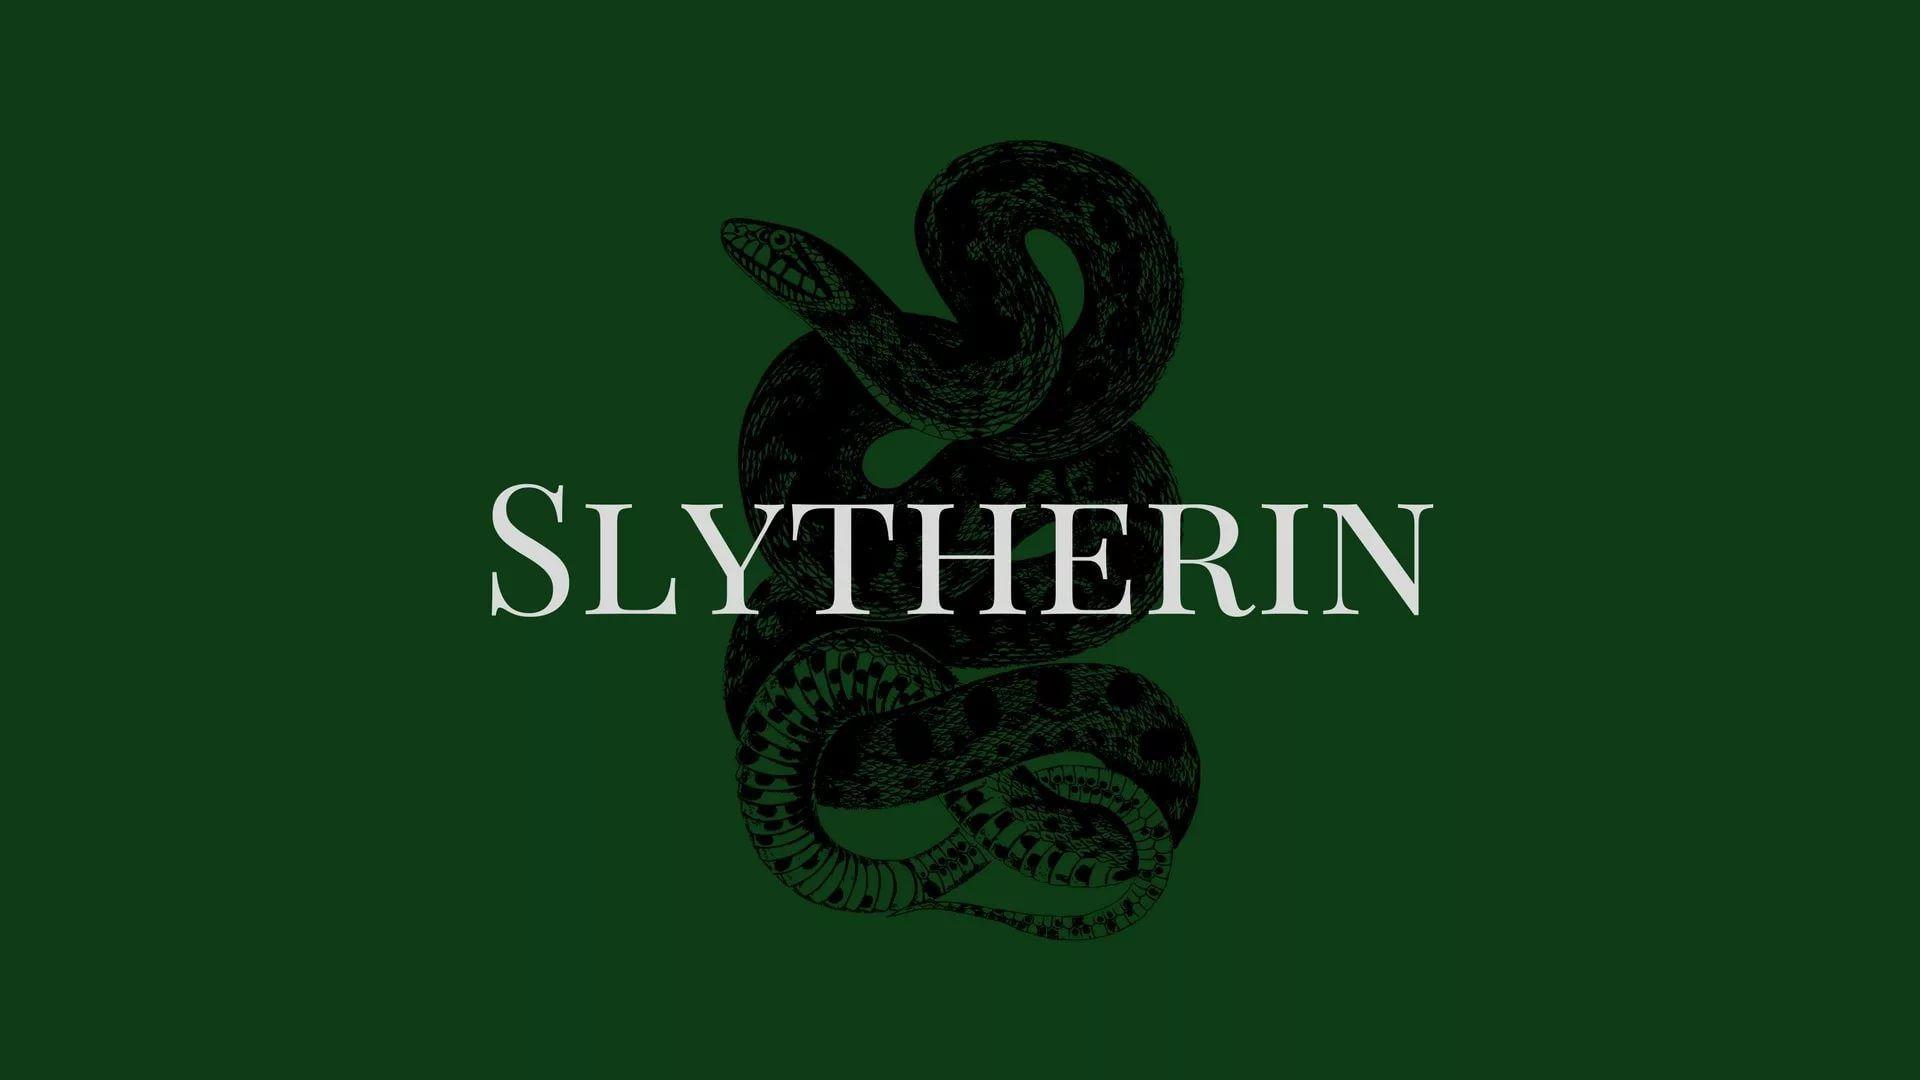 Slytherin Aesthetic Desktop Wallpapers Top Free Slytherin Aesthetic Desktop Backgrounds Wallpaperaccess